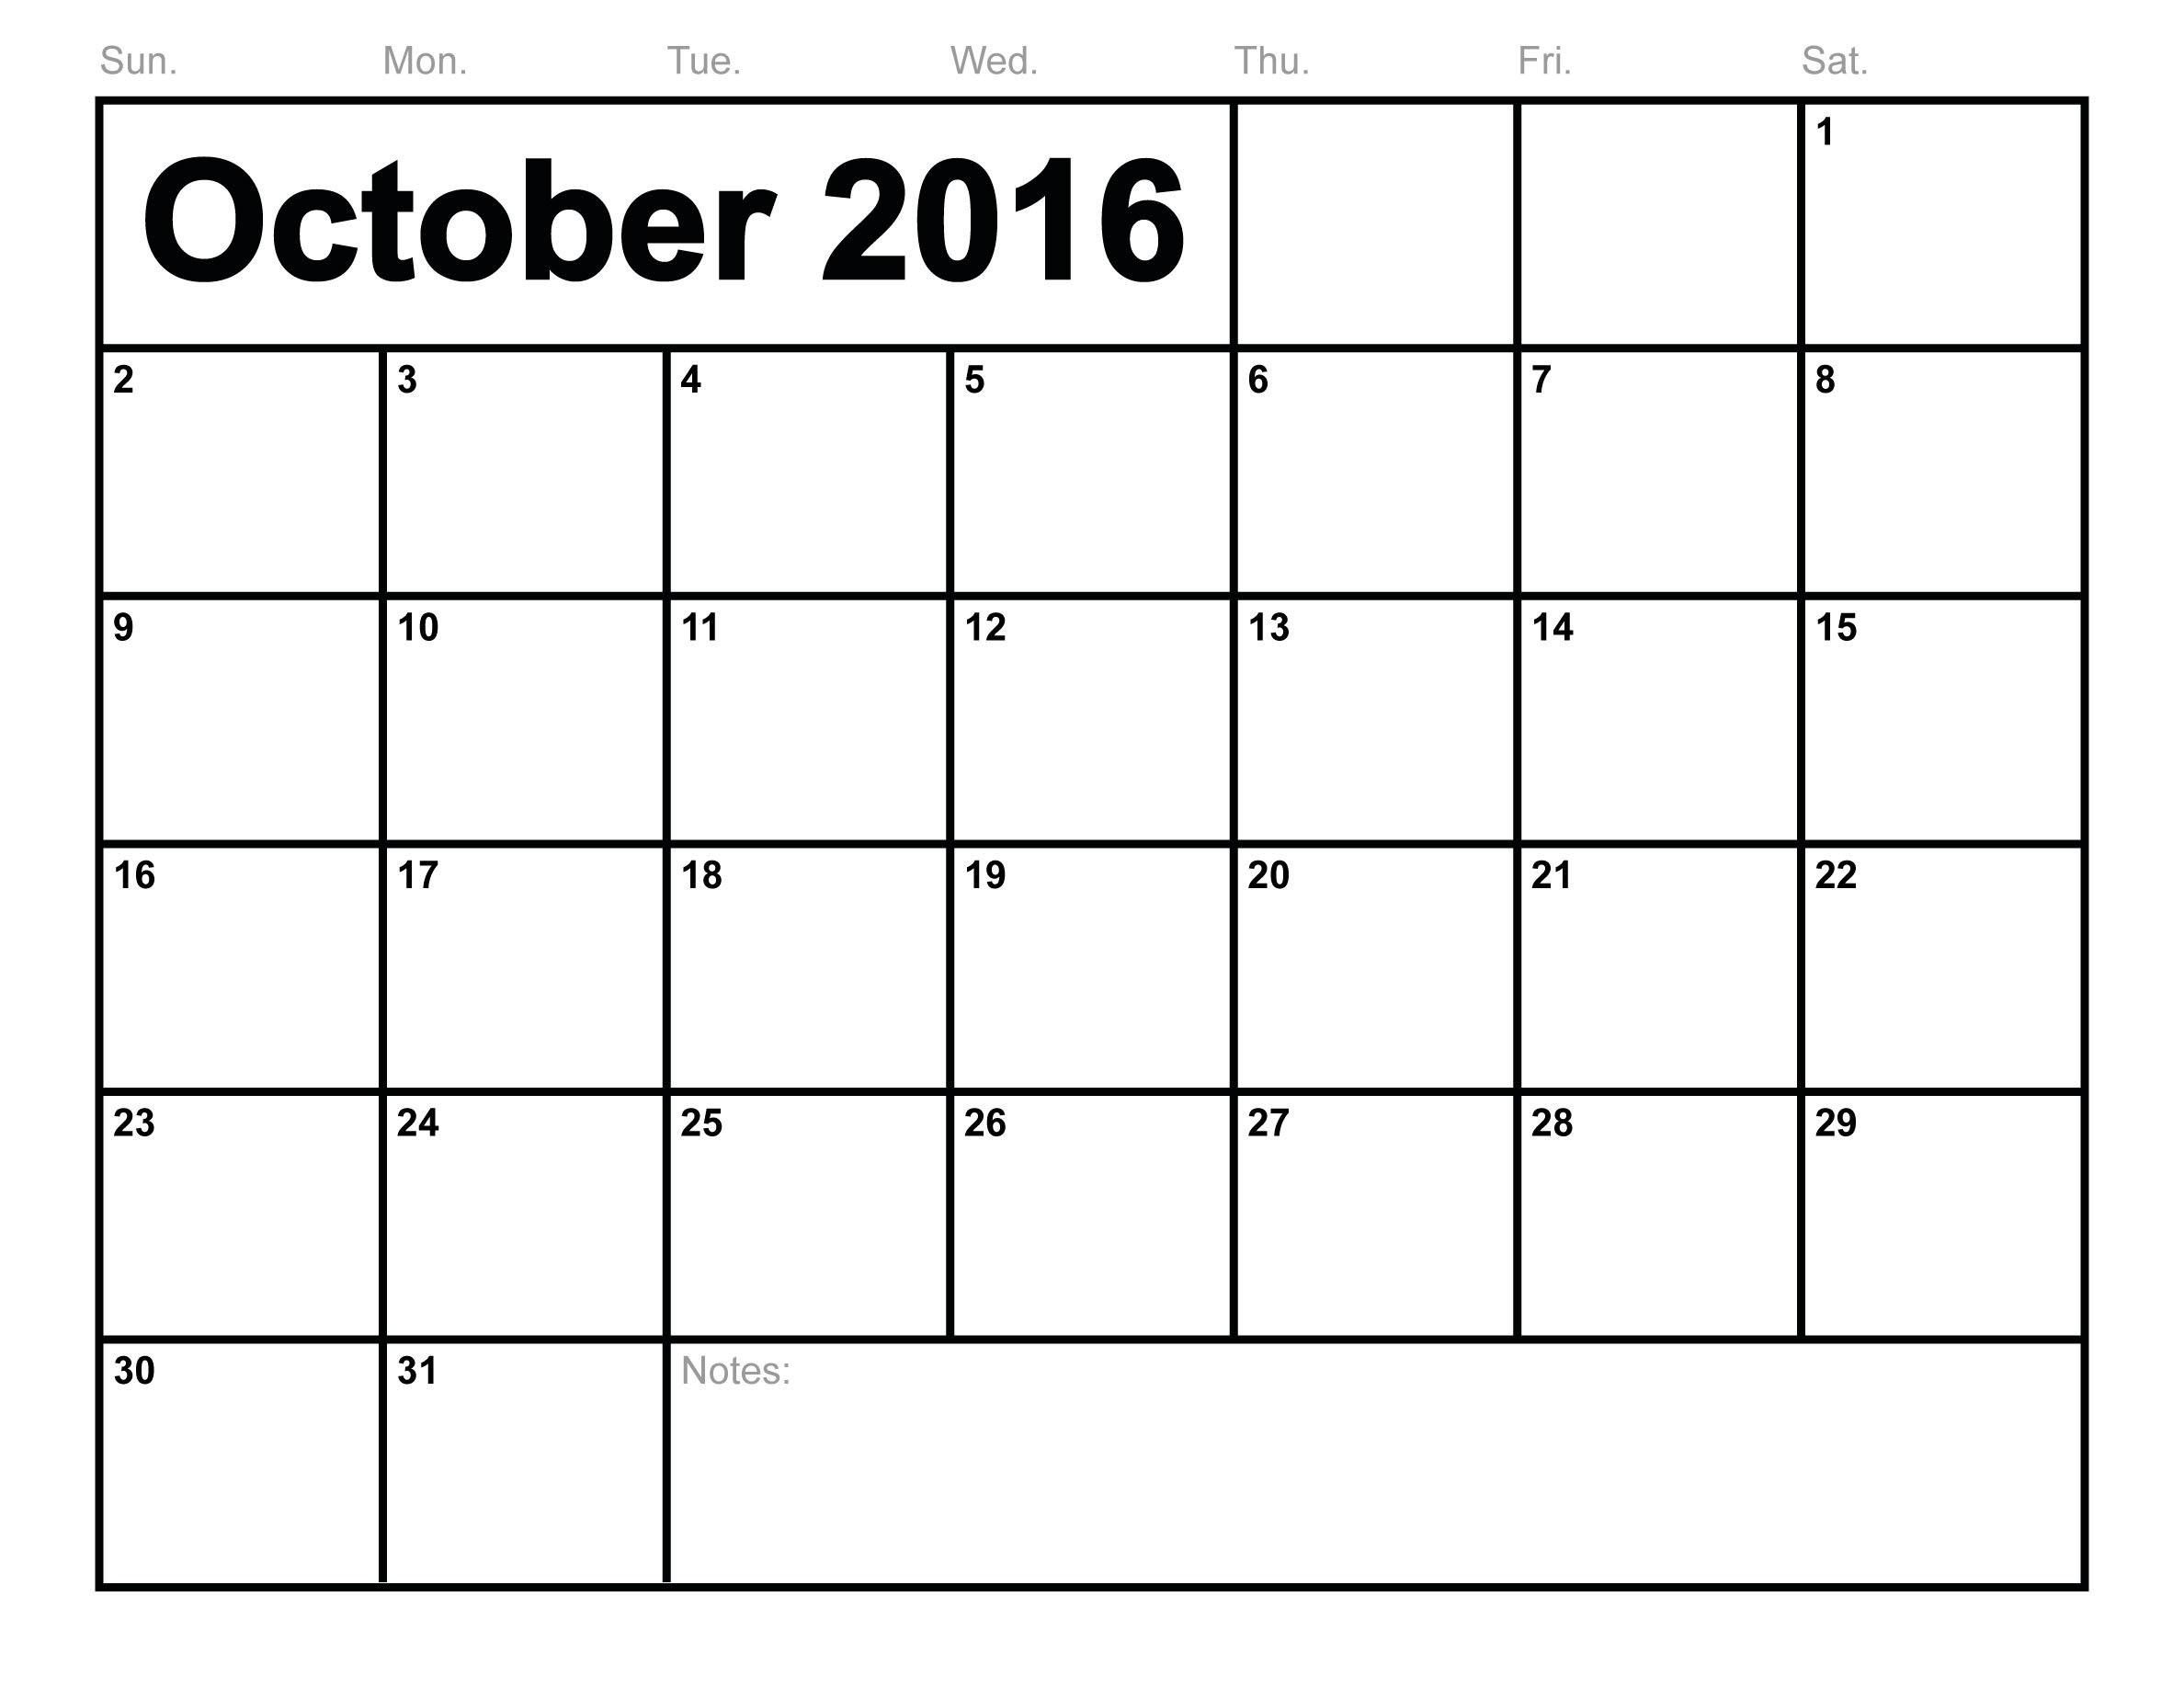 october-2016-calendar-october-2016-calendar-JwSTZr.jpg